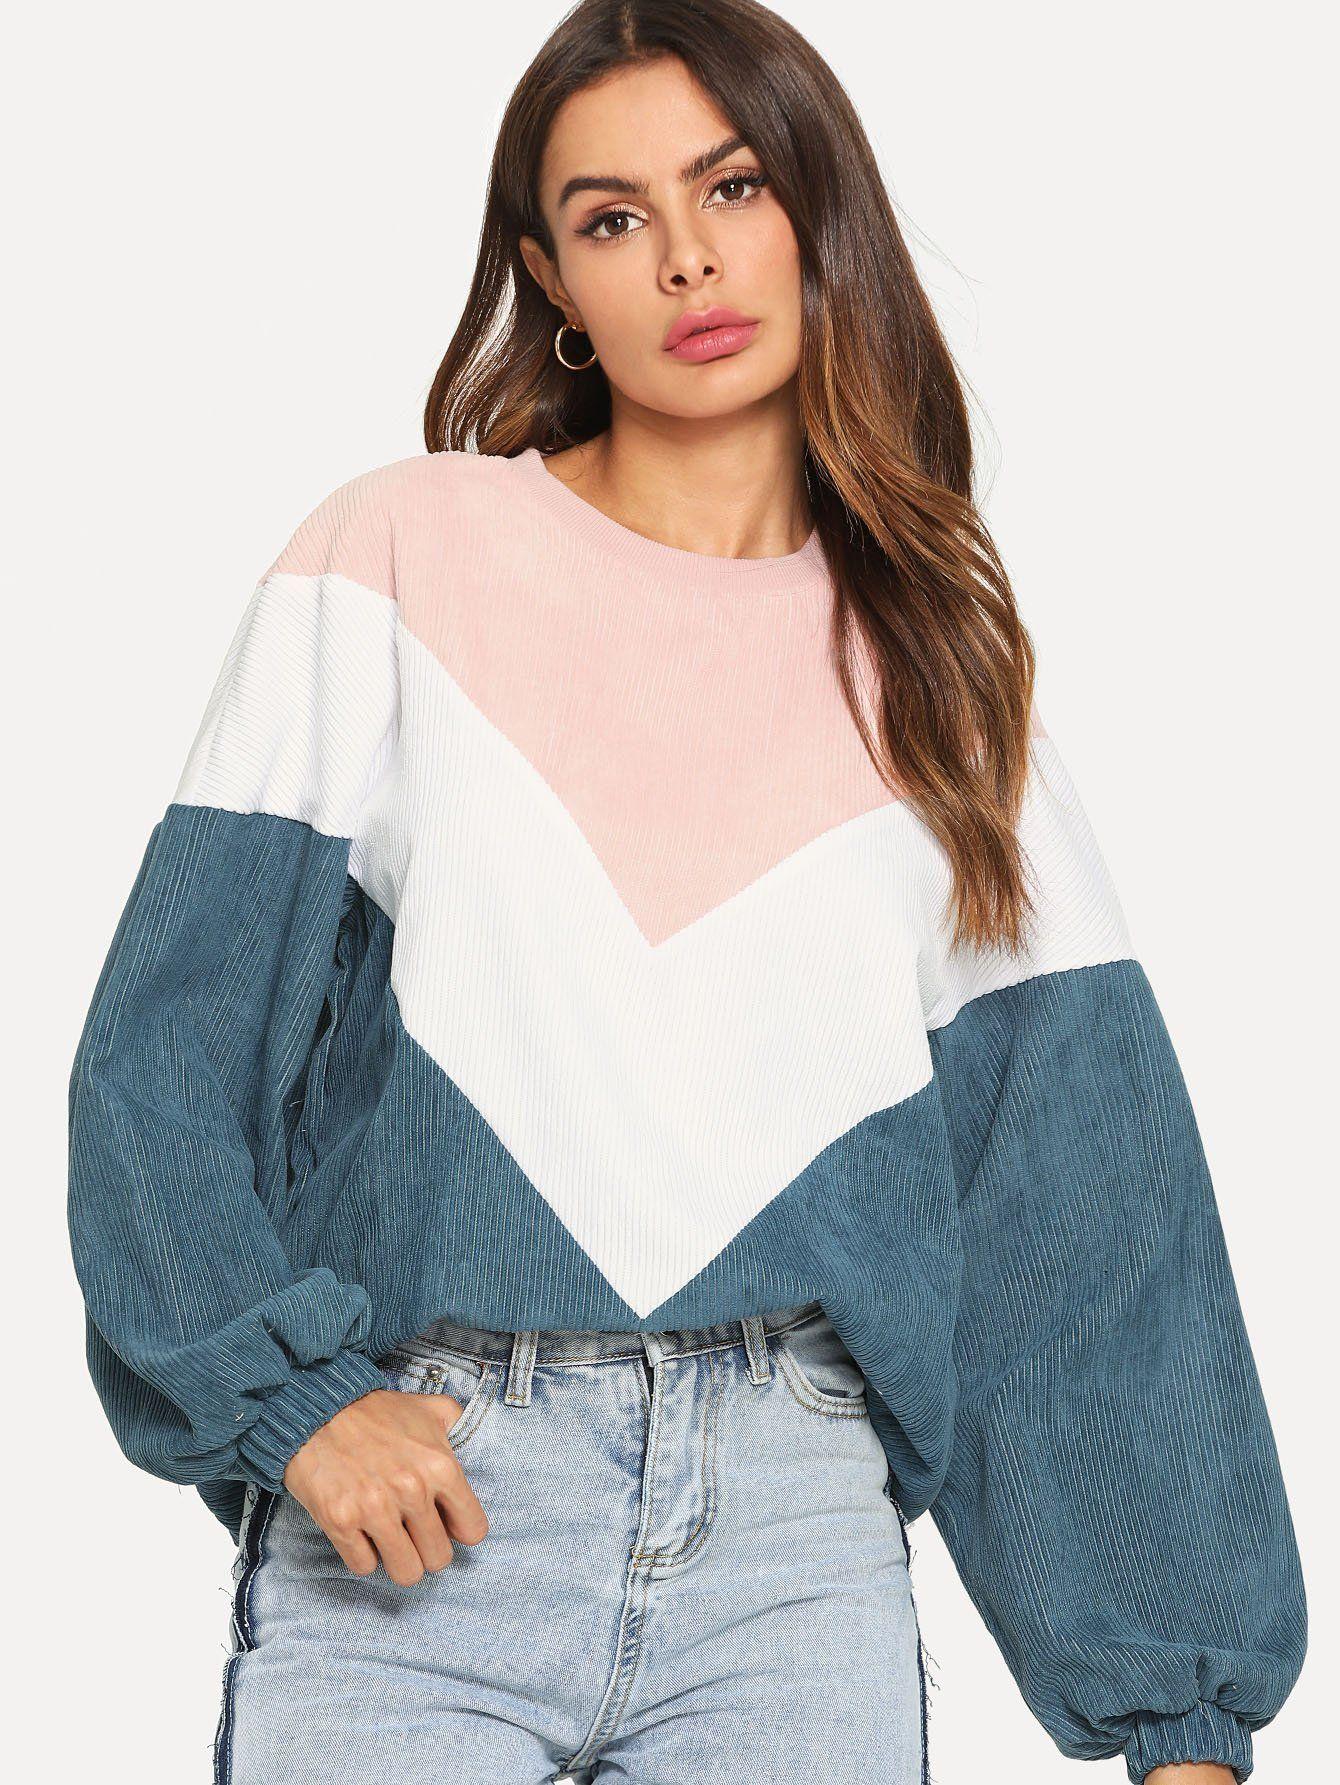 Fashion Trendsfall trend sweatshirts